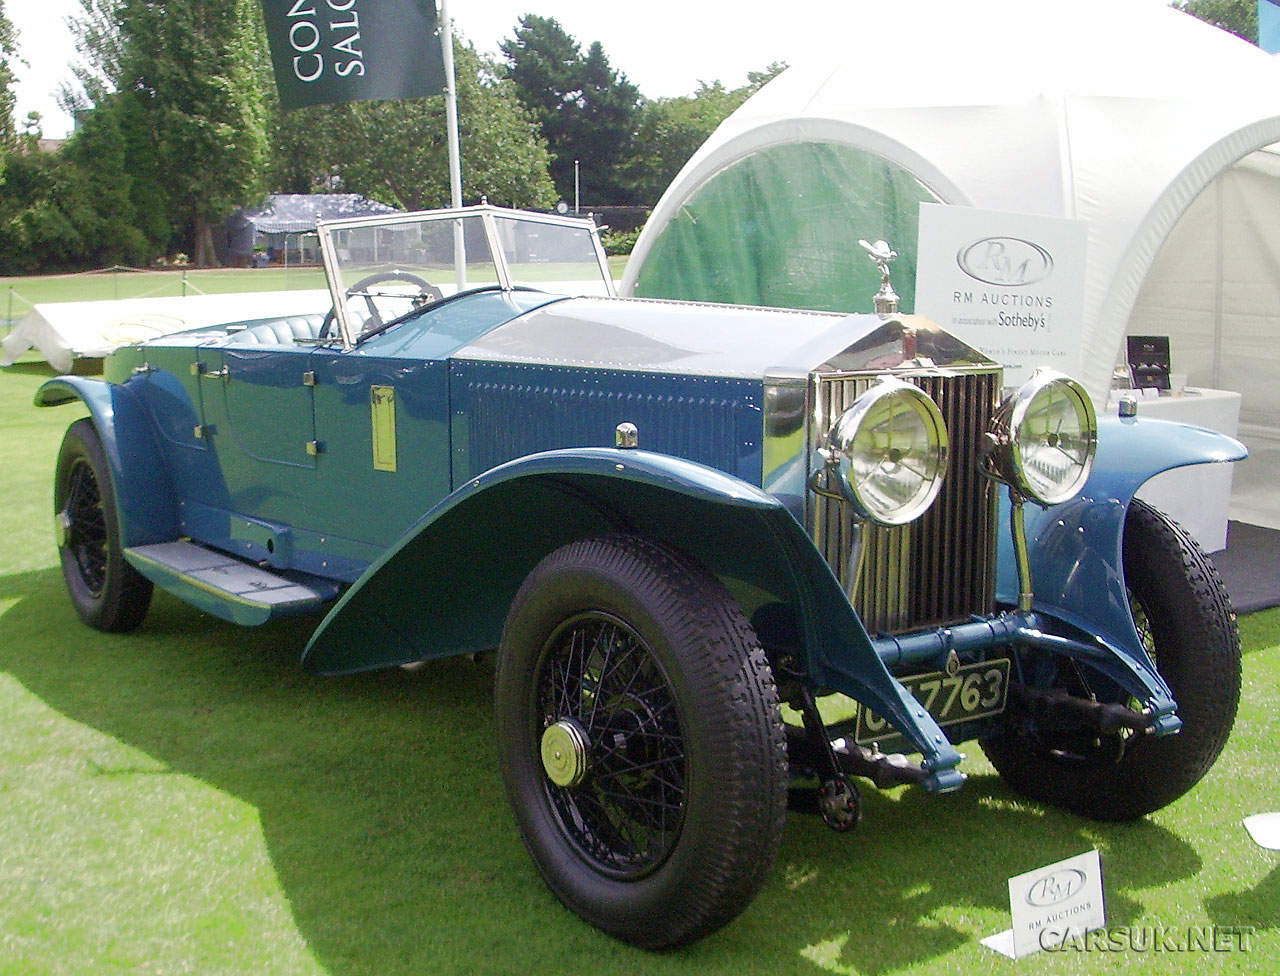 Salon Prive Classic Cars.